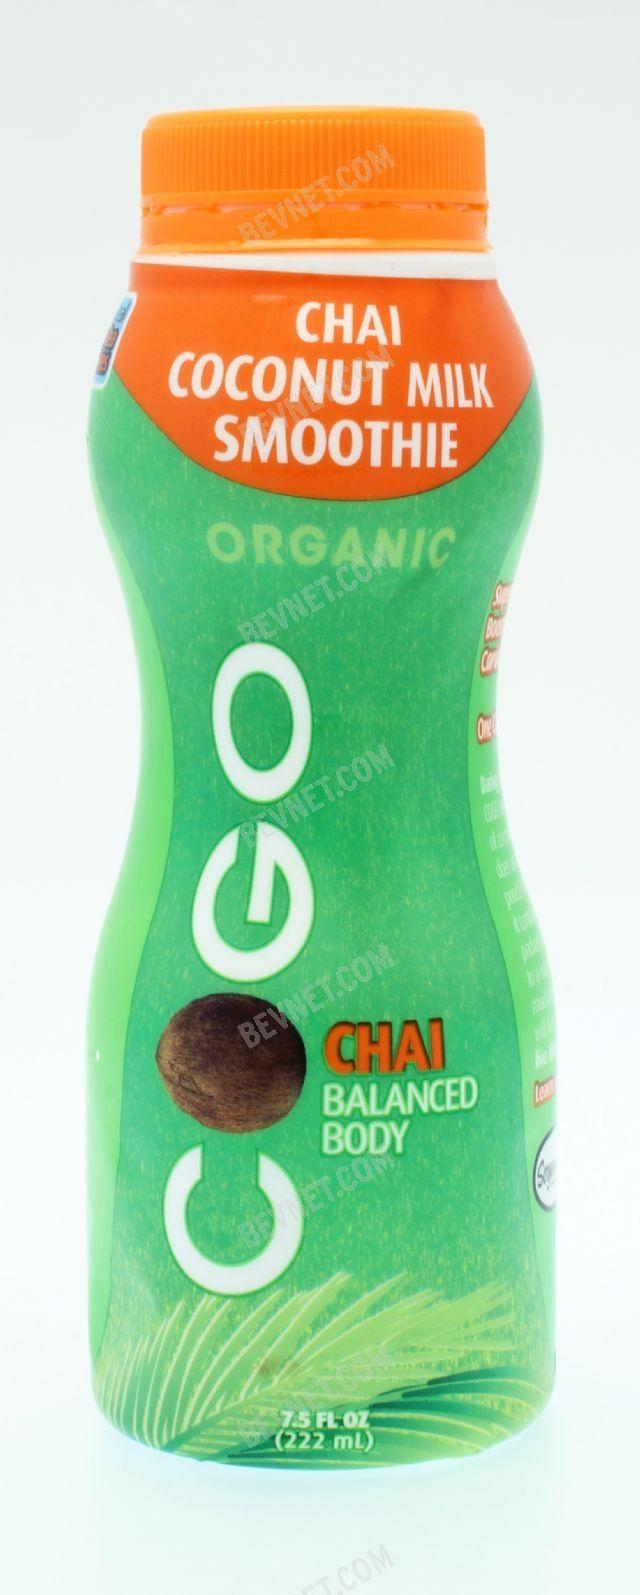 Cogo Coconut Milk Smoothies: